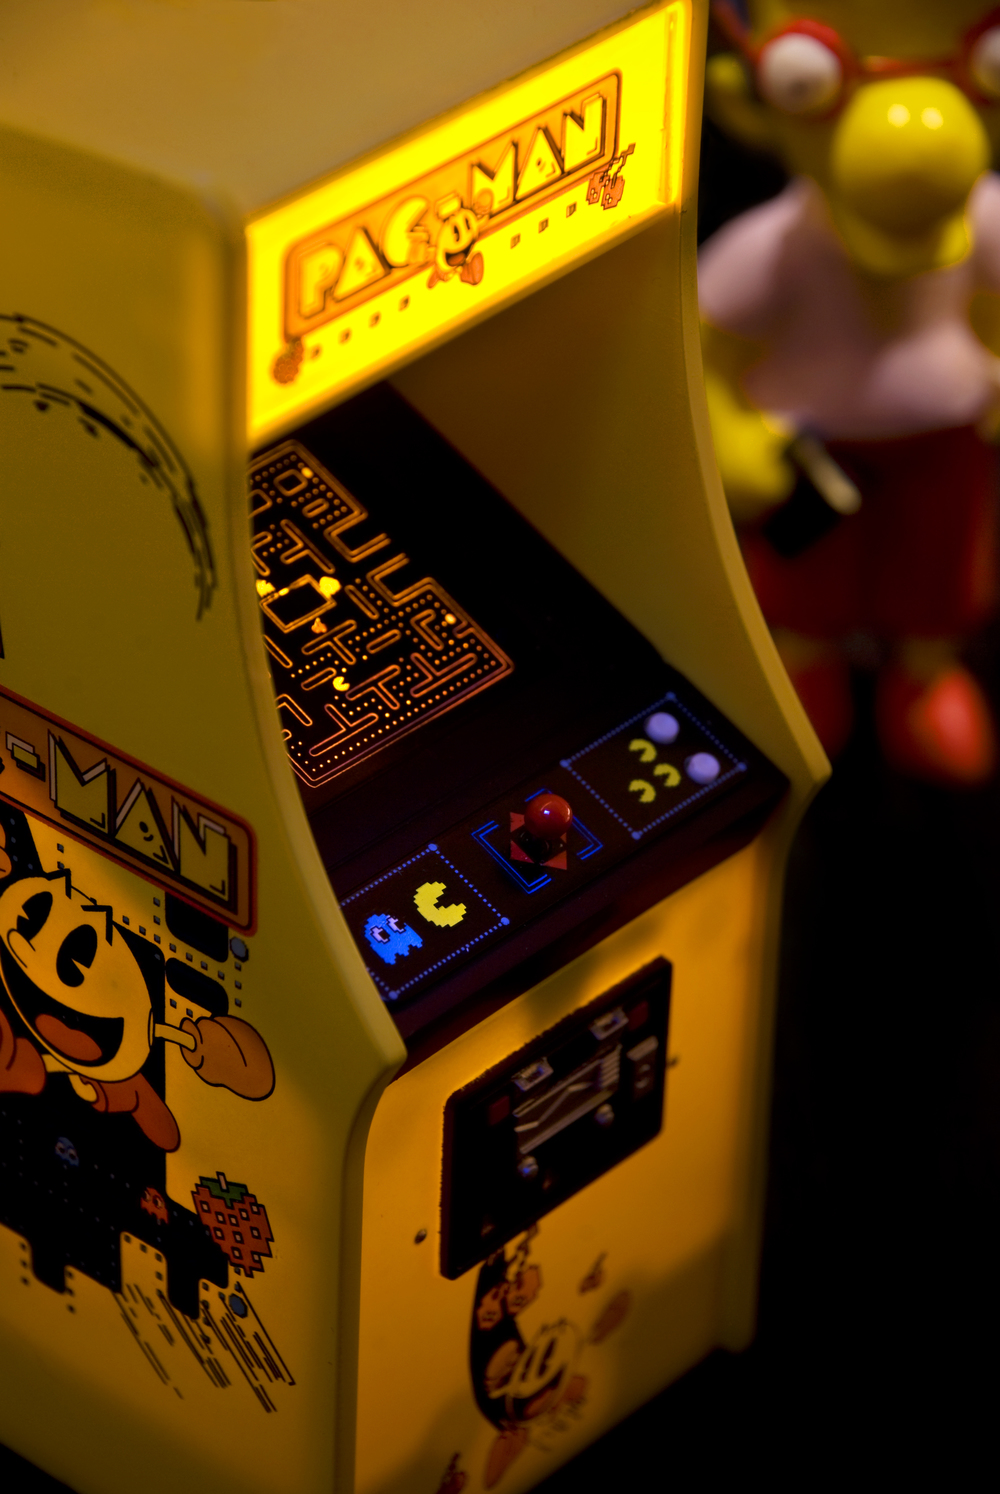 12-11-08 PacMan.jpg